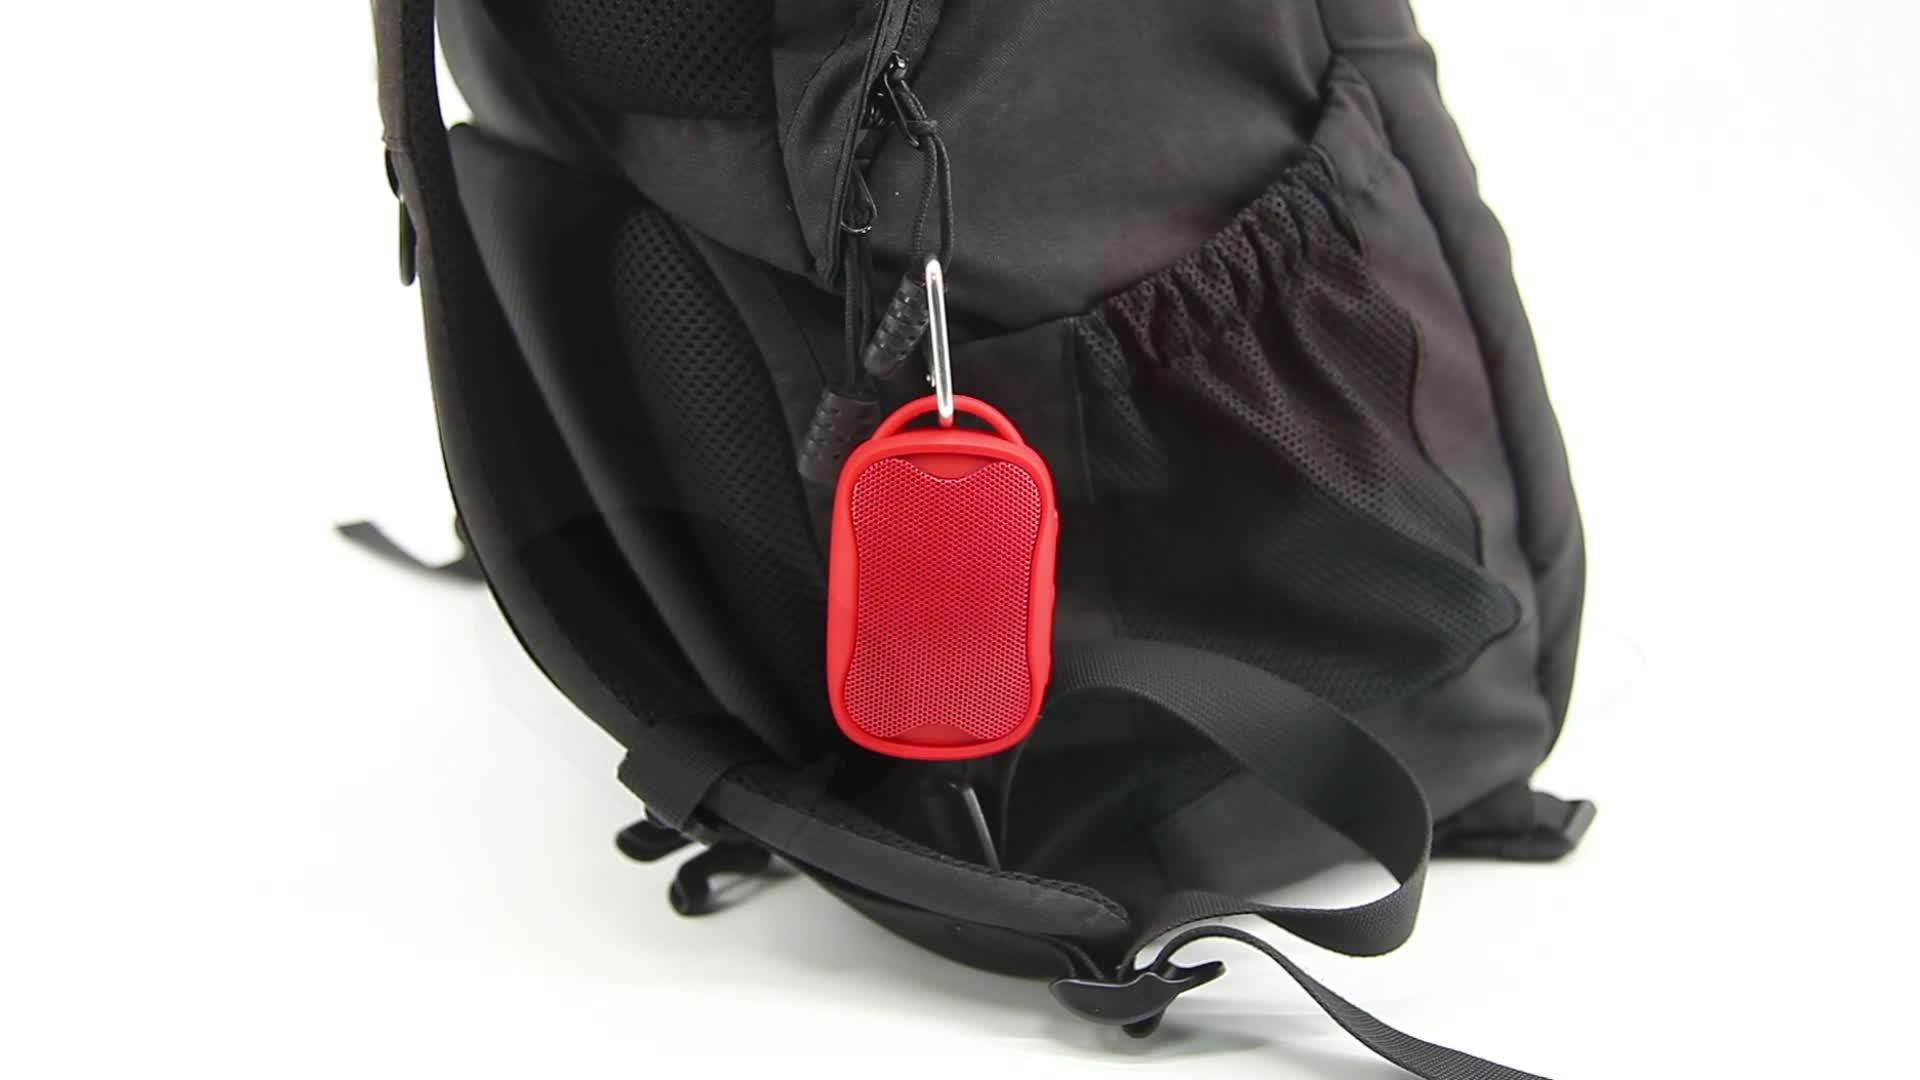 Hotsale 휴대용 미니 스피커 USB 충전 로고 무선 스피커